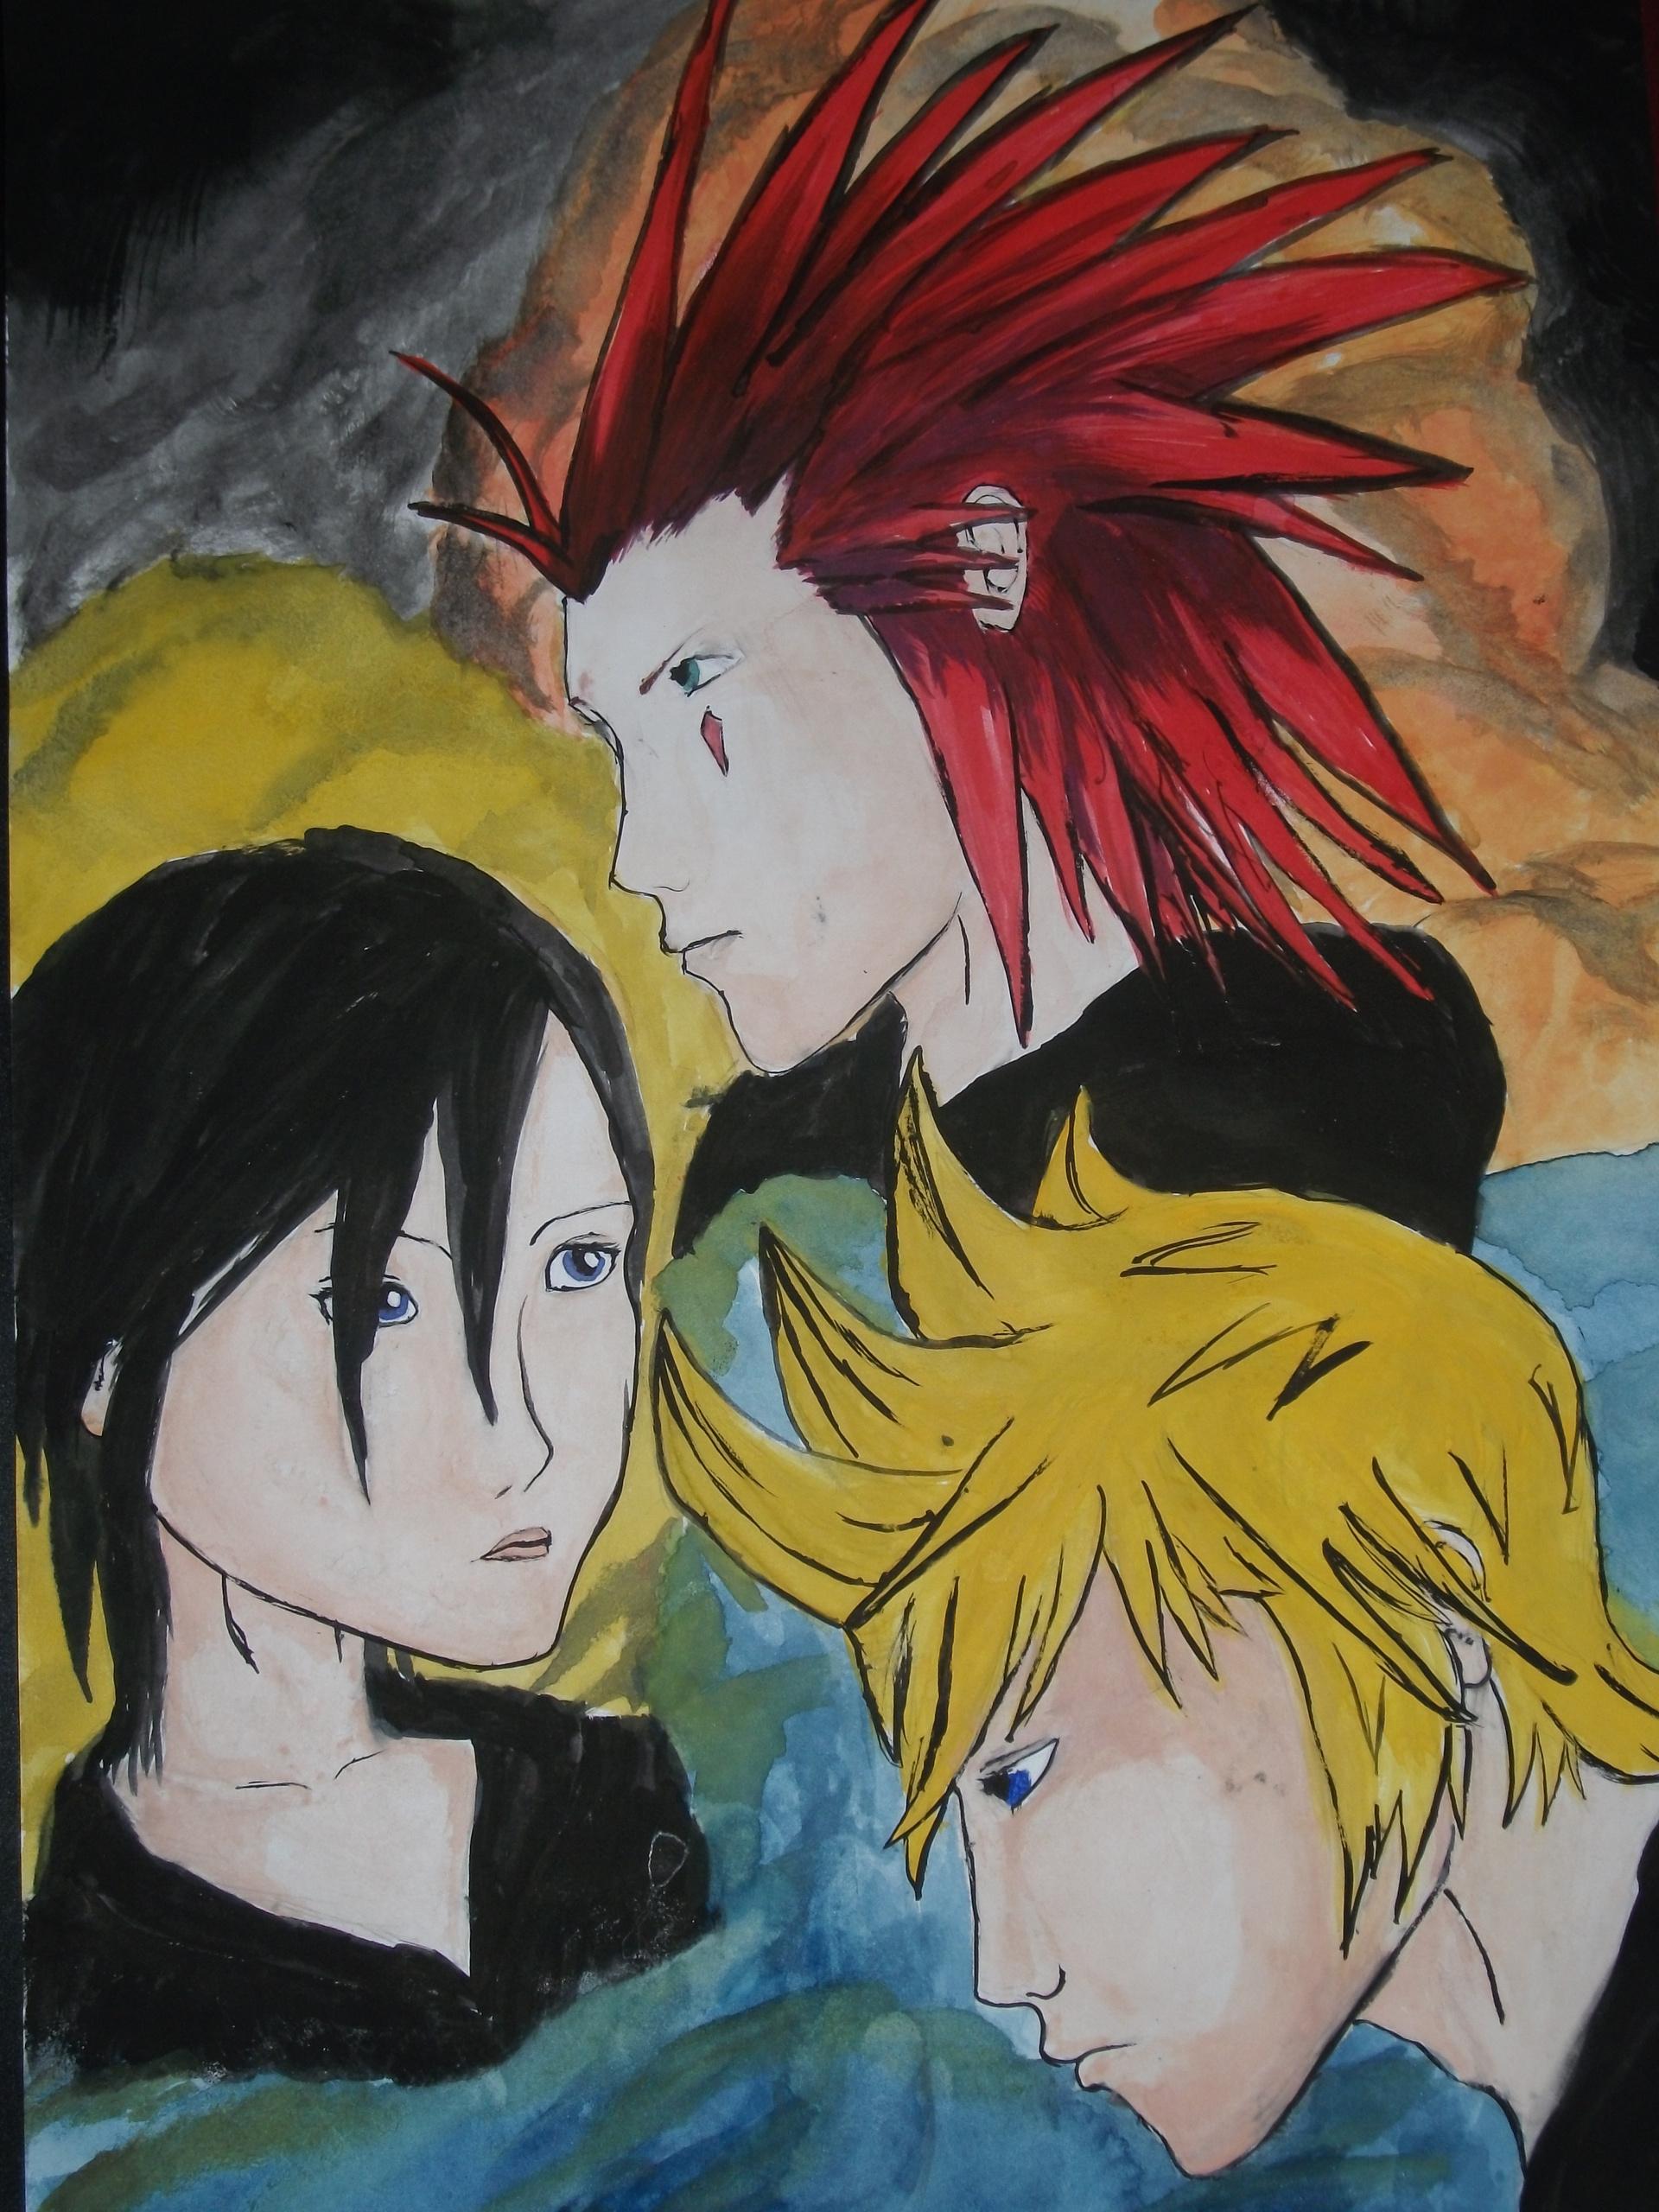 Axel, Roxas and Xion